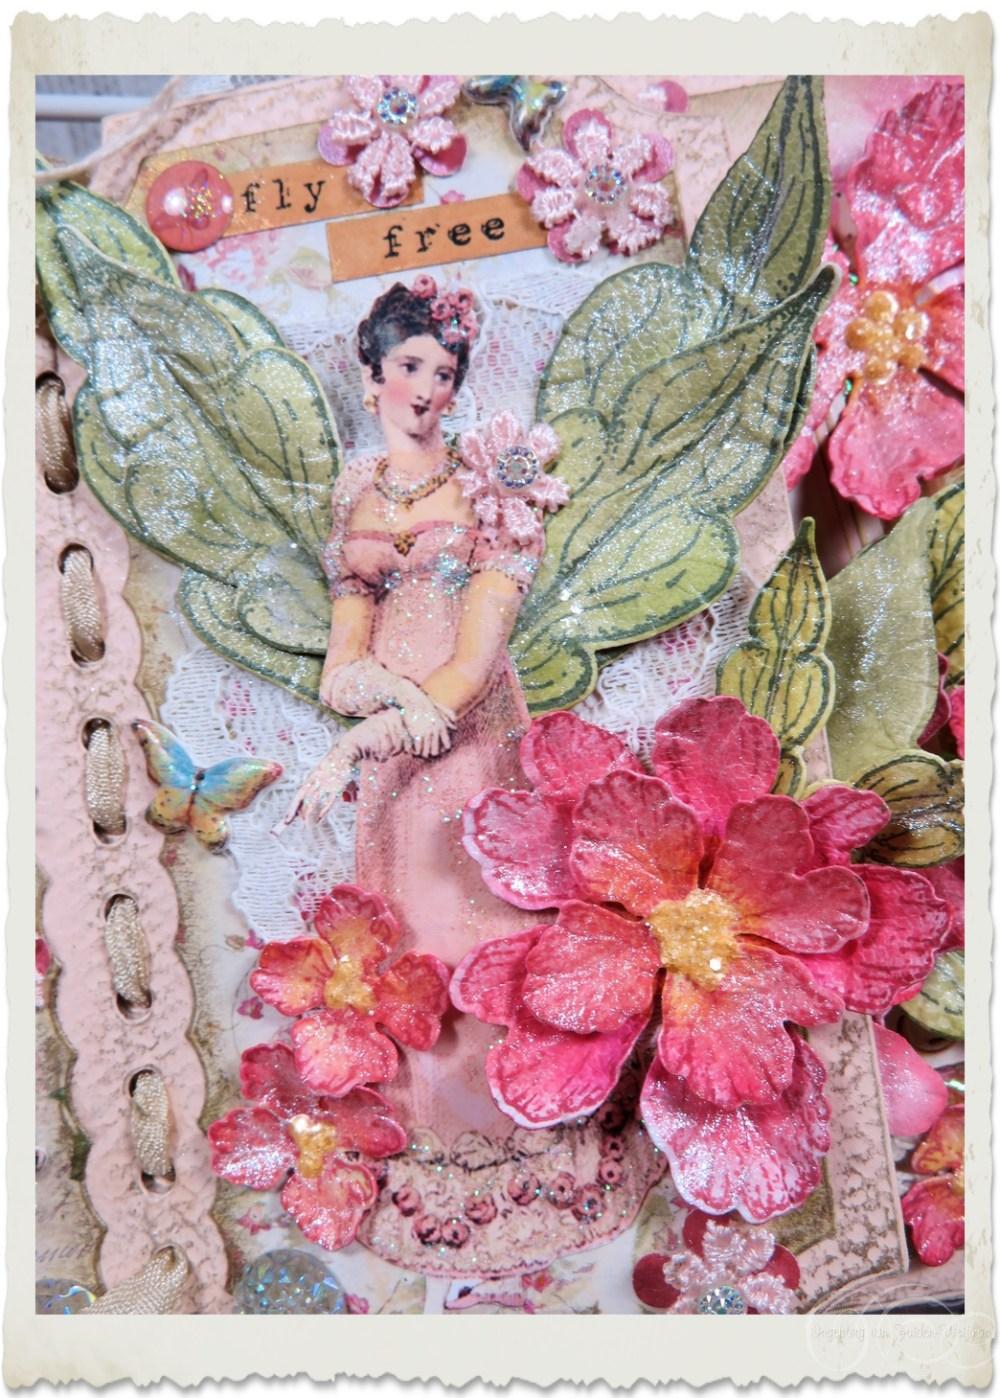 Regency fairy with peony flower by Ingeborg van Zuiden